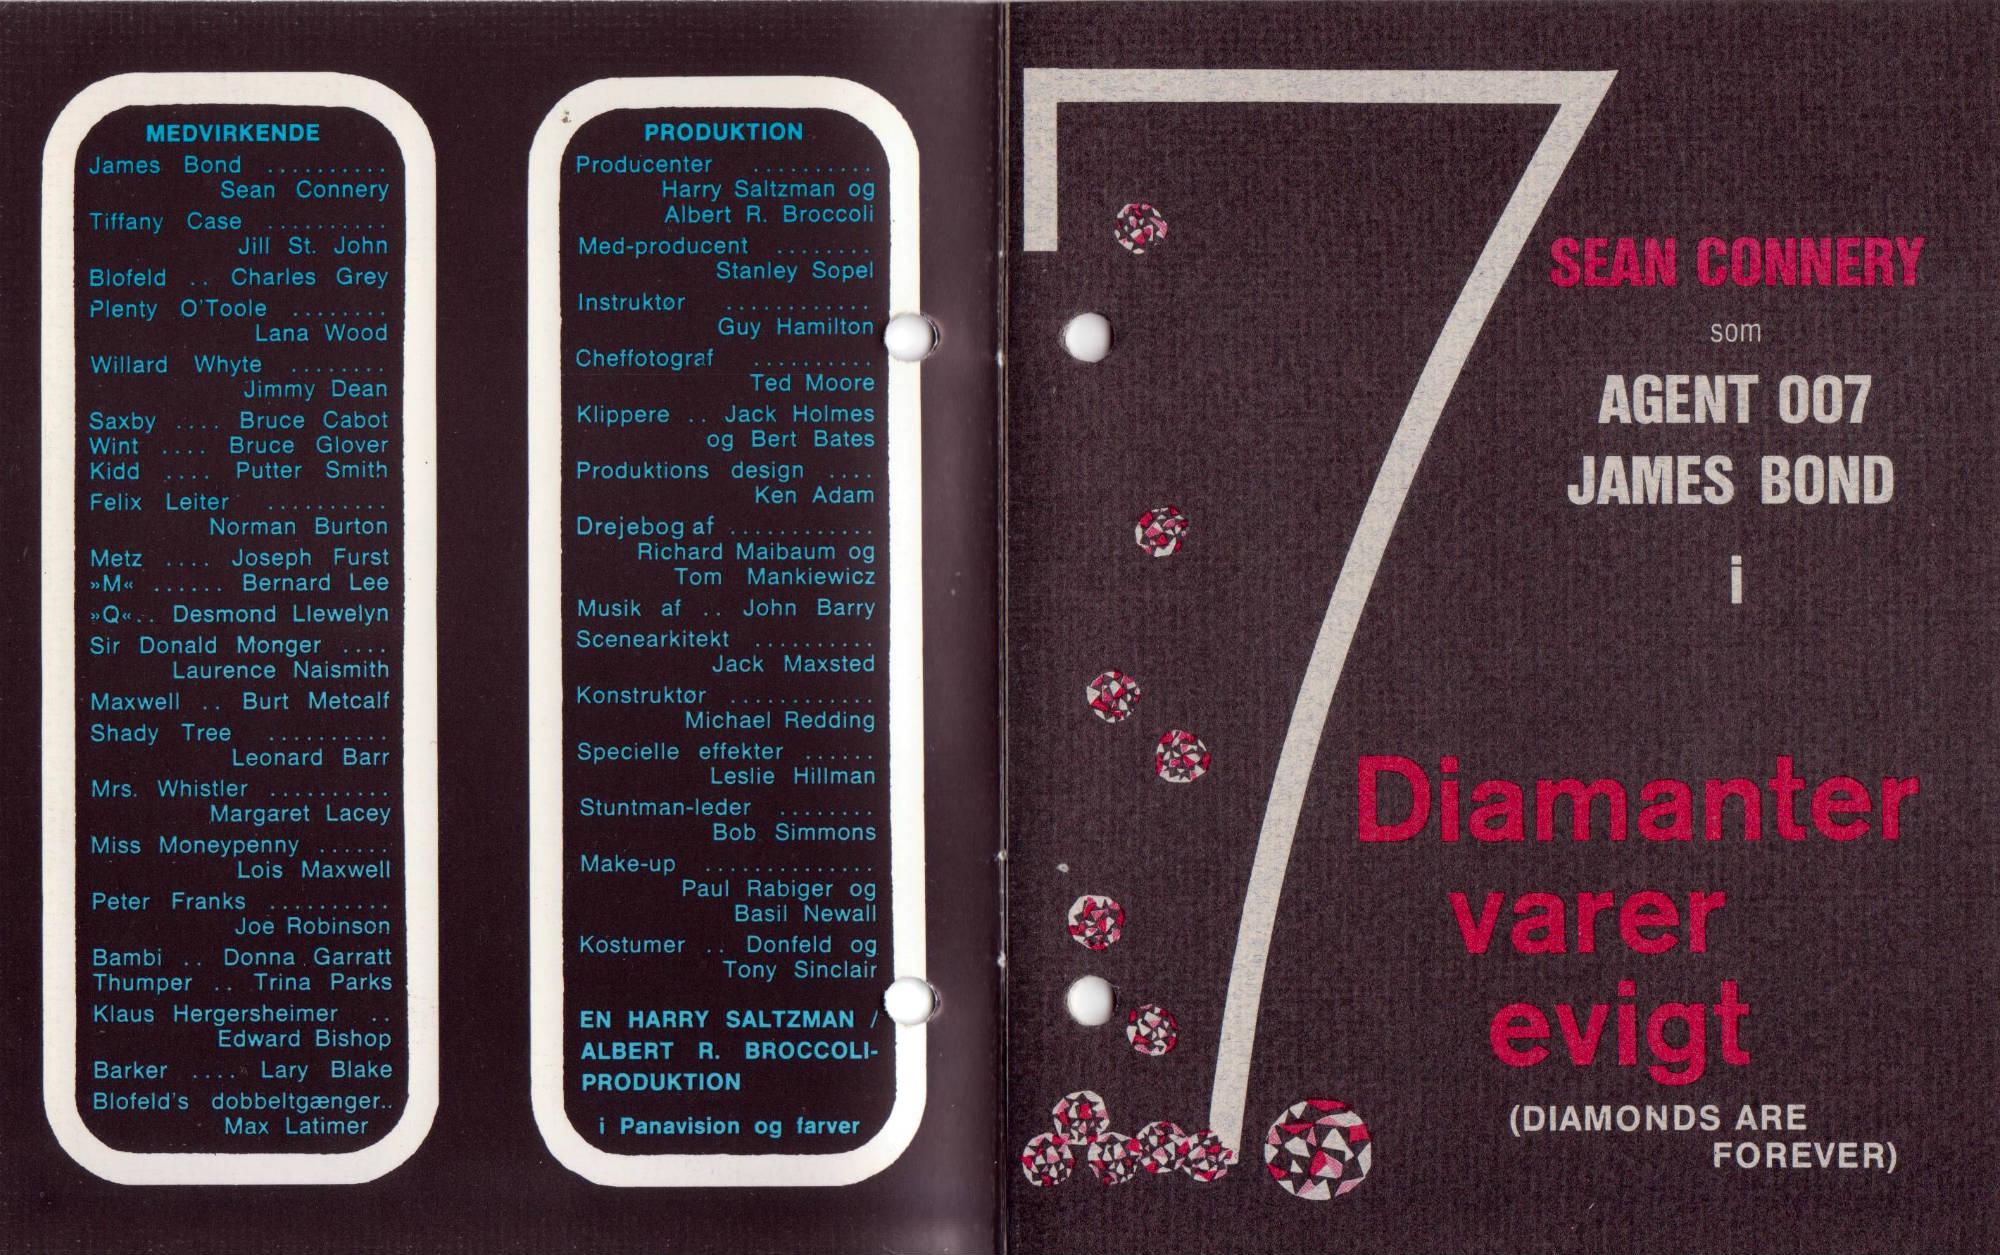 Diamanter varer evigt - filmprogram B